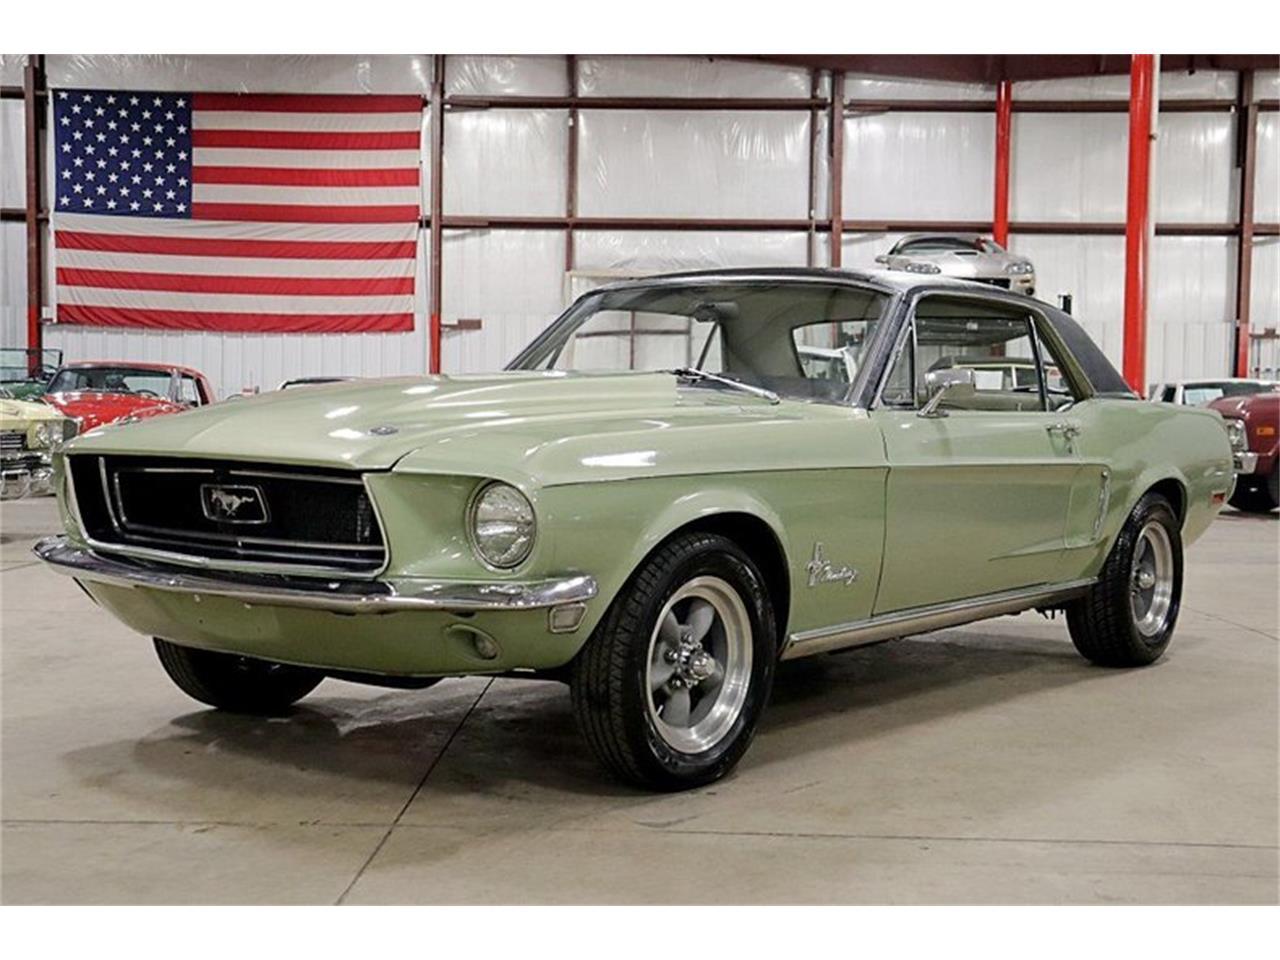 Ford Mustang V8 n289 1968 prix tout compris 1968